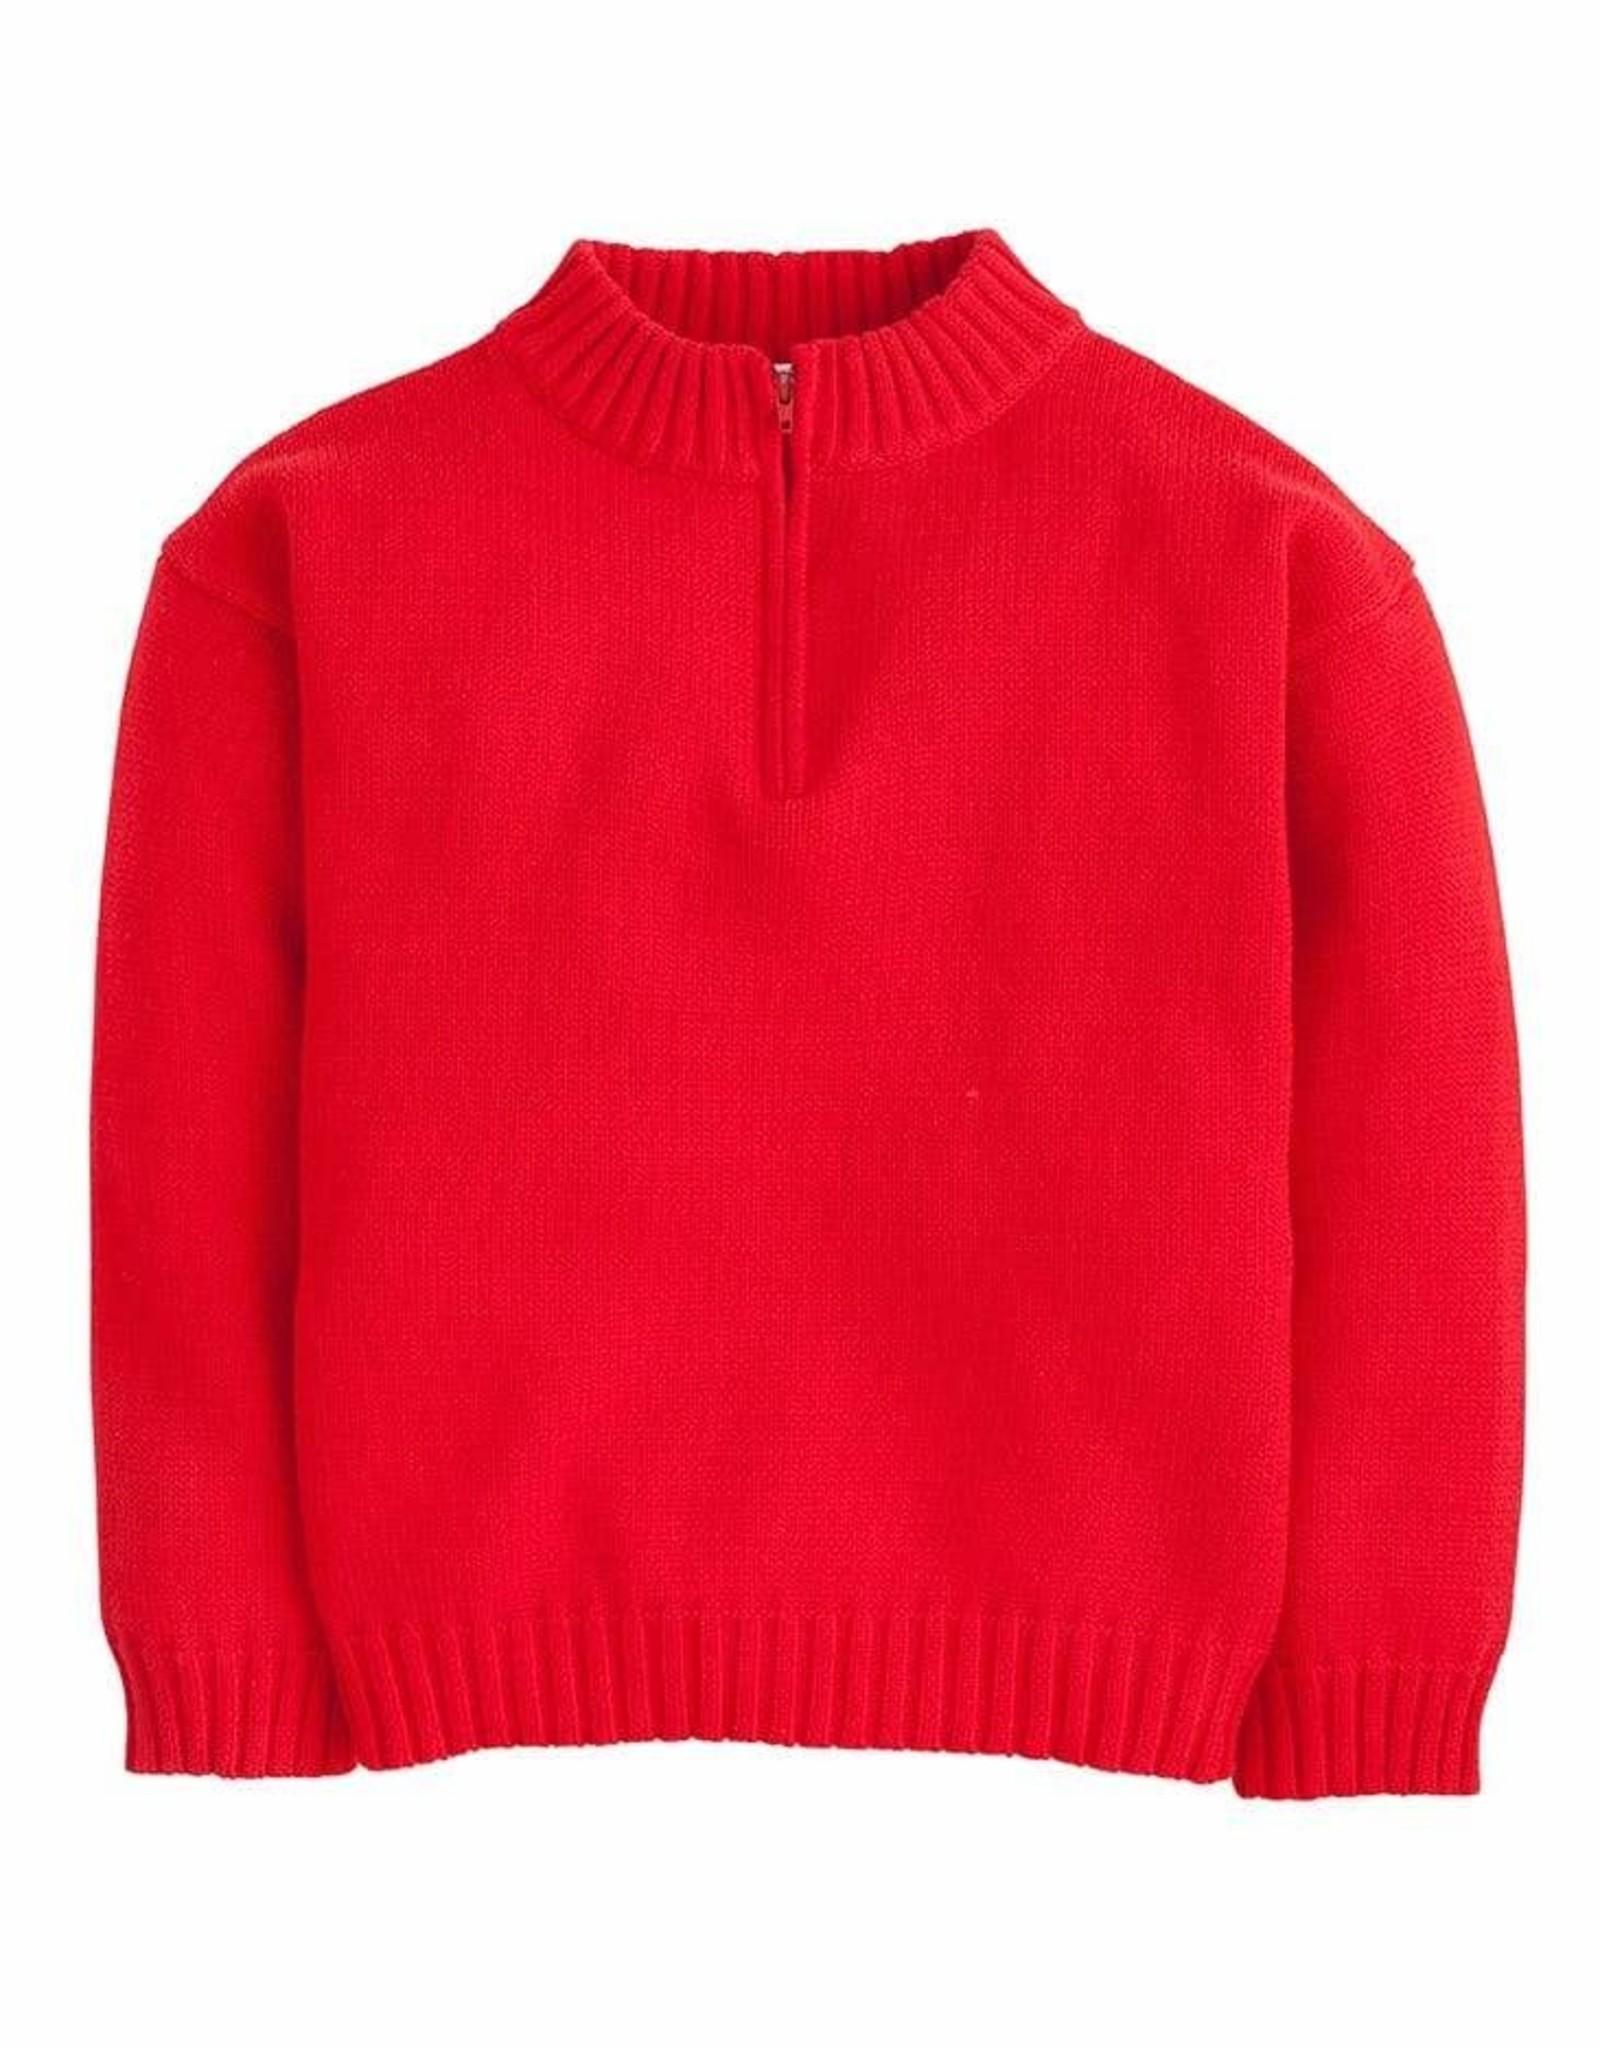 Little English Quarter Zip Sweater, Red